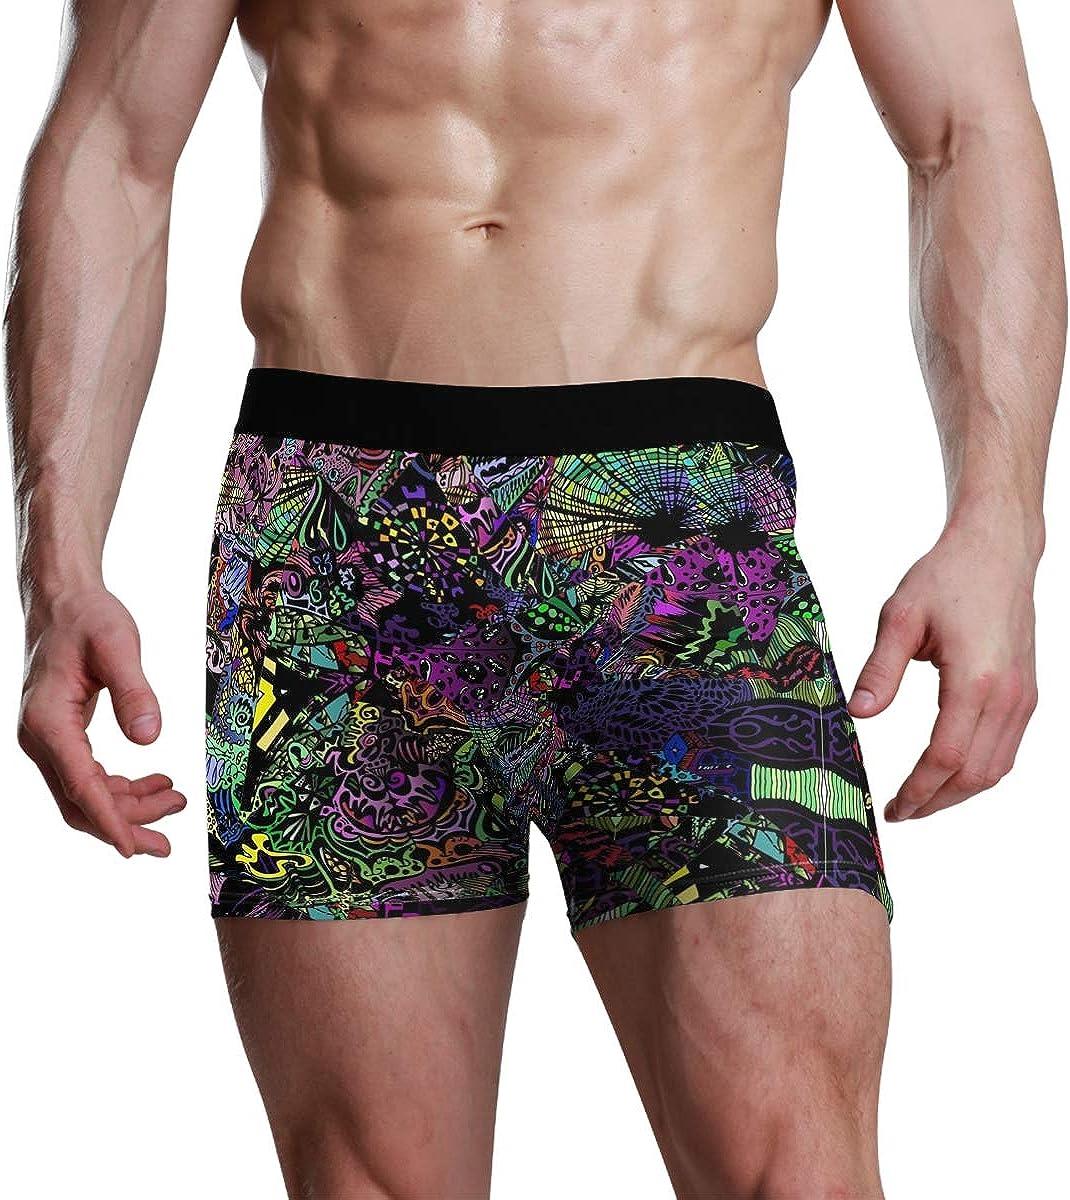 HangWang Mens Boxer Briefs Underwear Black Background Abstract Patterns Trunks Underwear Short Leg Boys